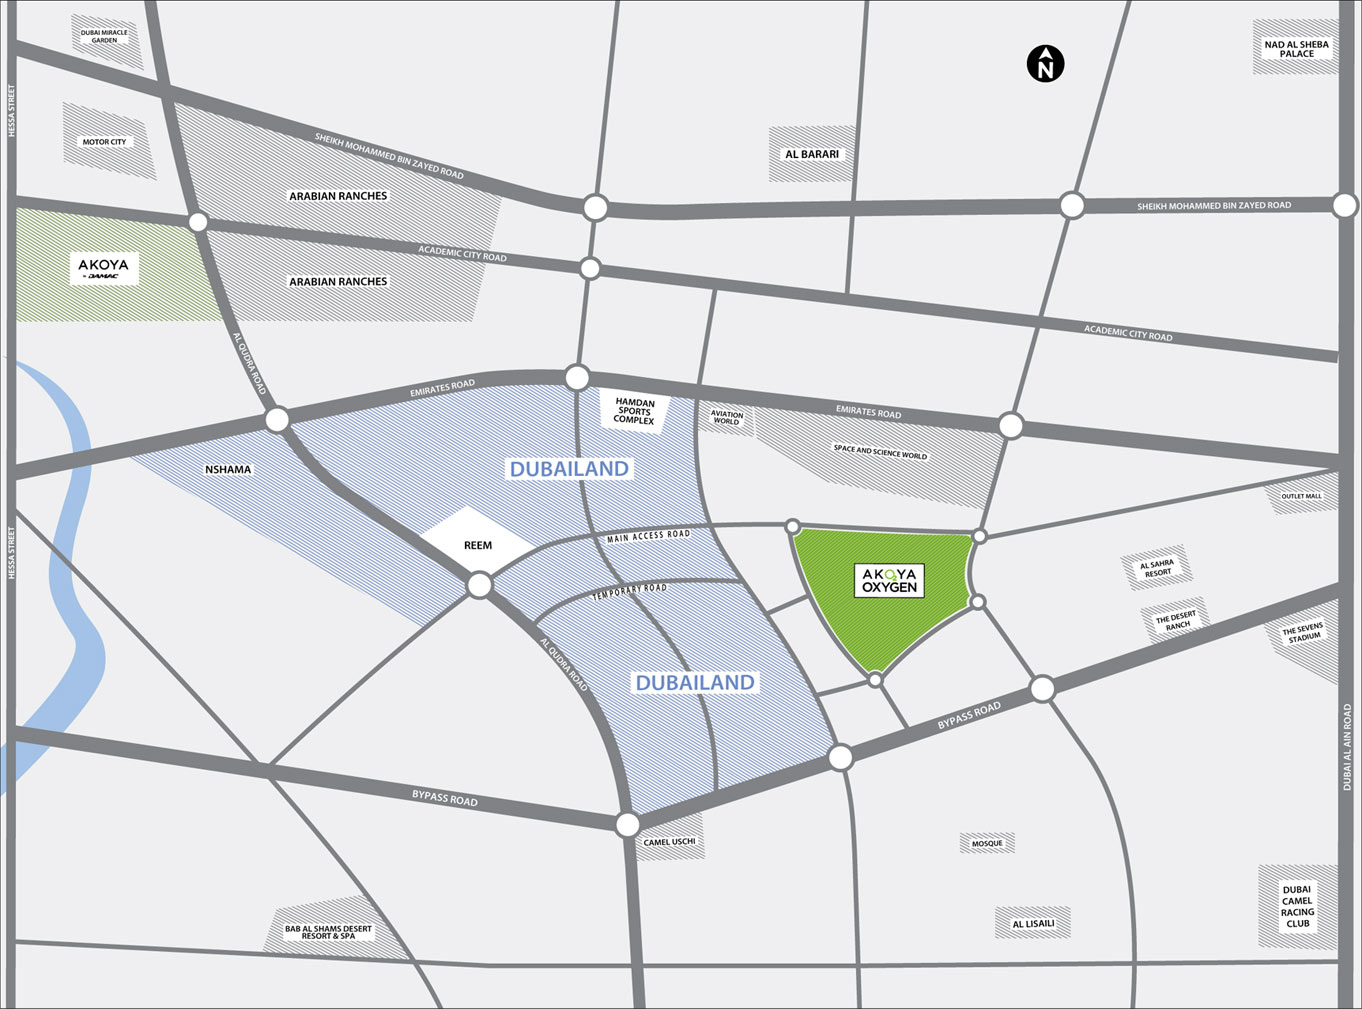 Damac-Akoya-Imagine-Plots Location Map